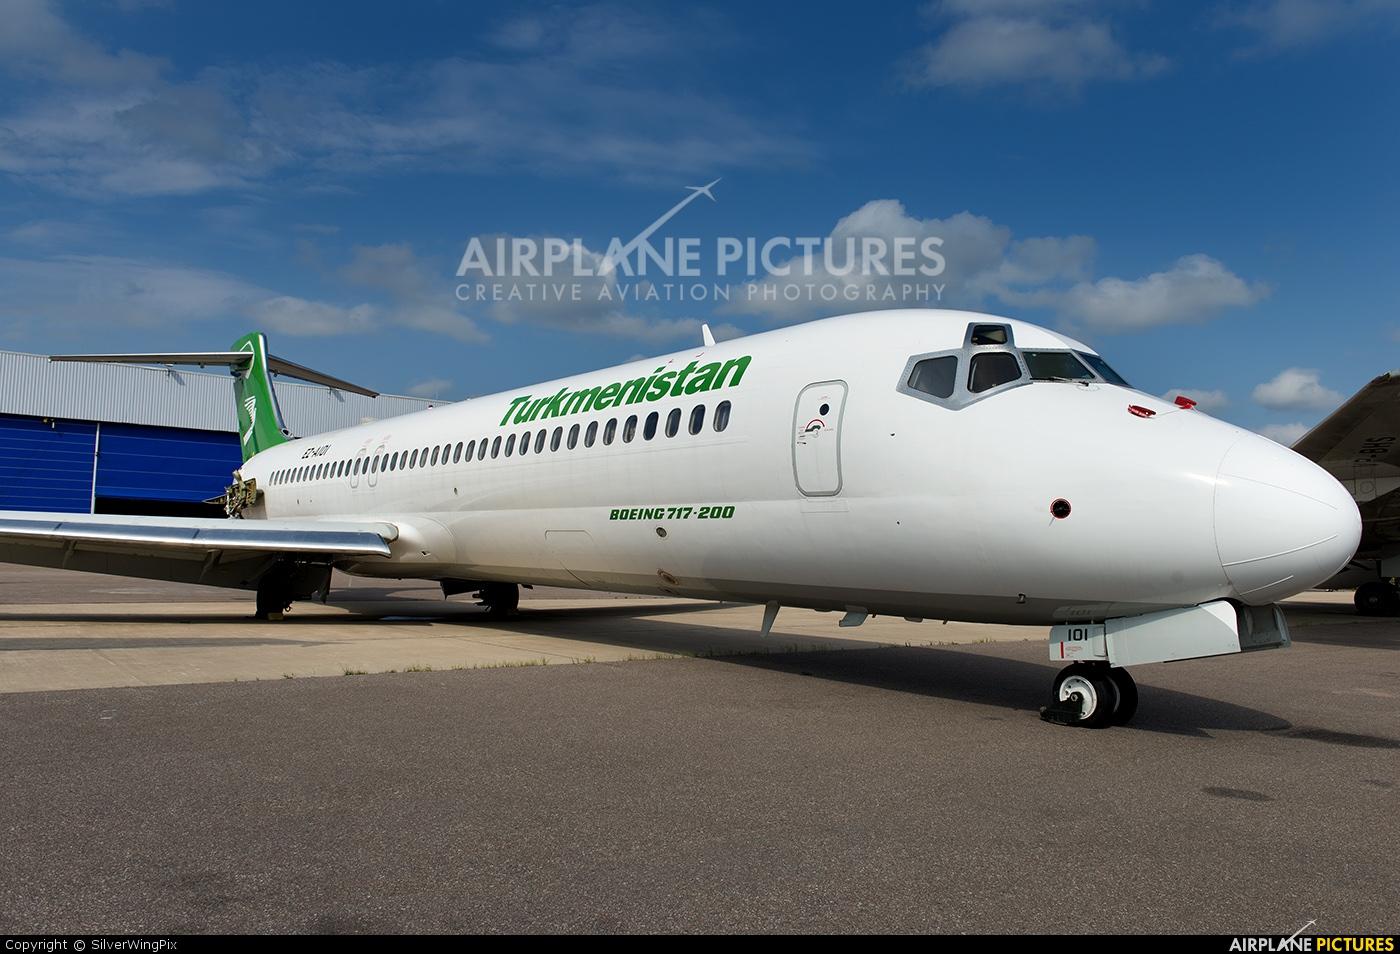 Turkmenistan Airlines EZ-A101 aircraft at Stockholm - Arlanda